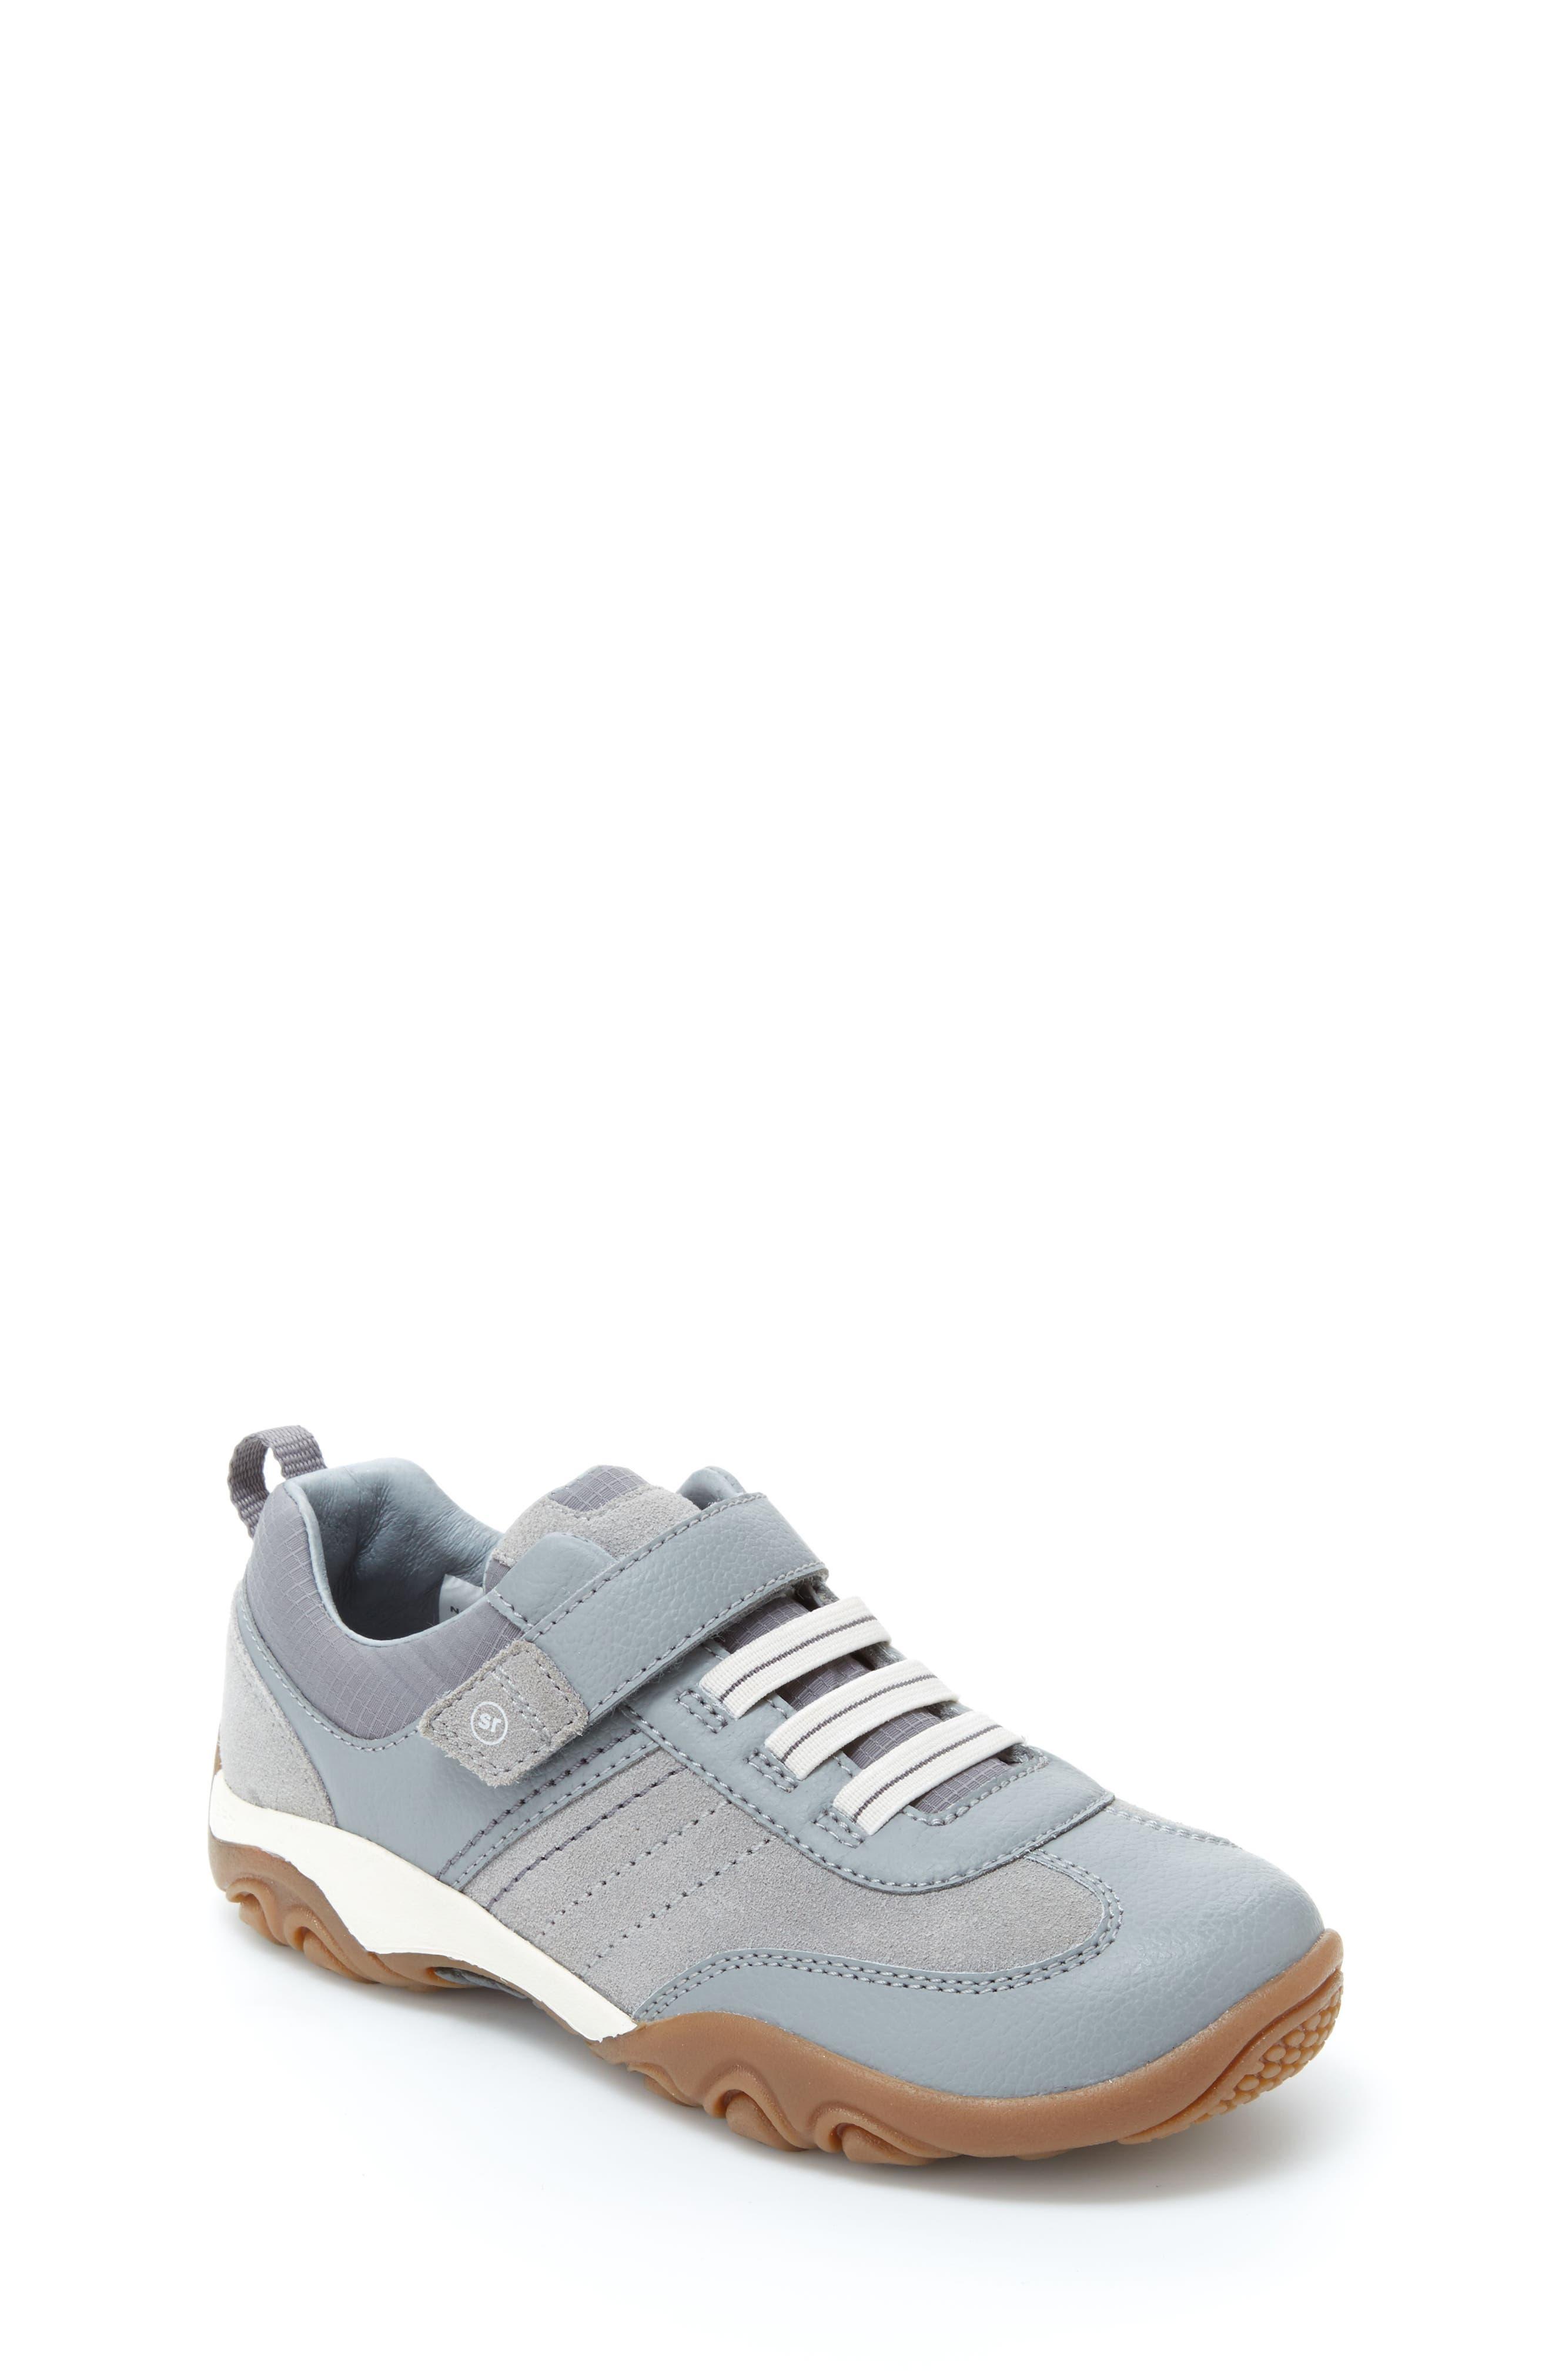 'SRT Prescott' Sneaker,                             Main thumbnail 1, color,                             Grey 2